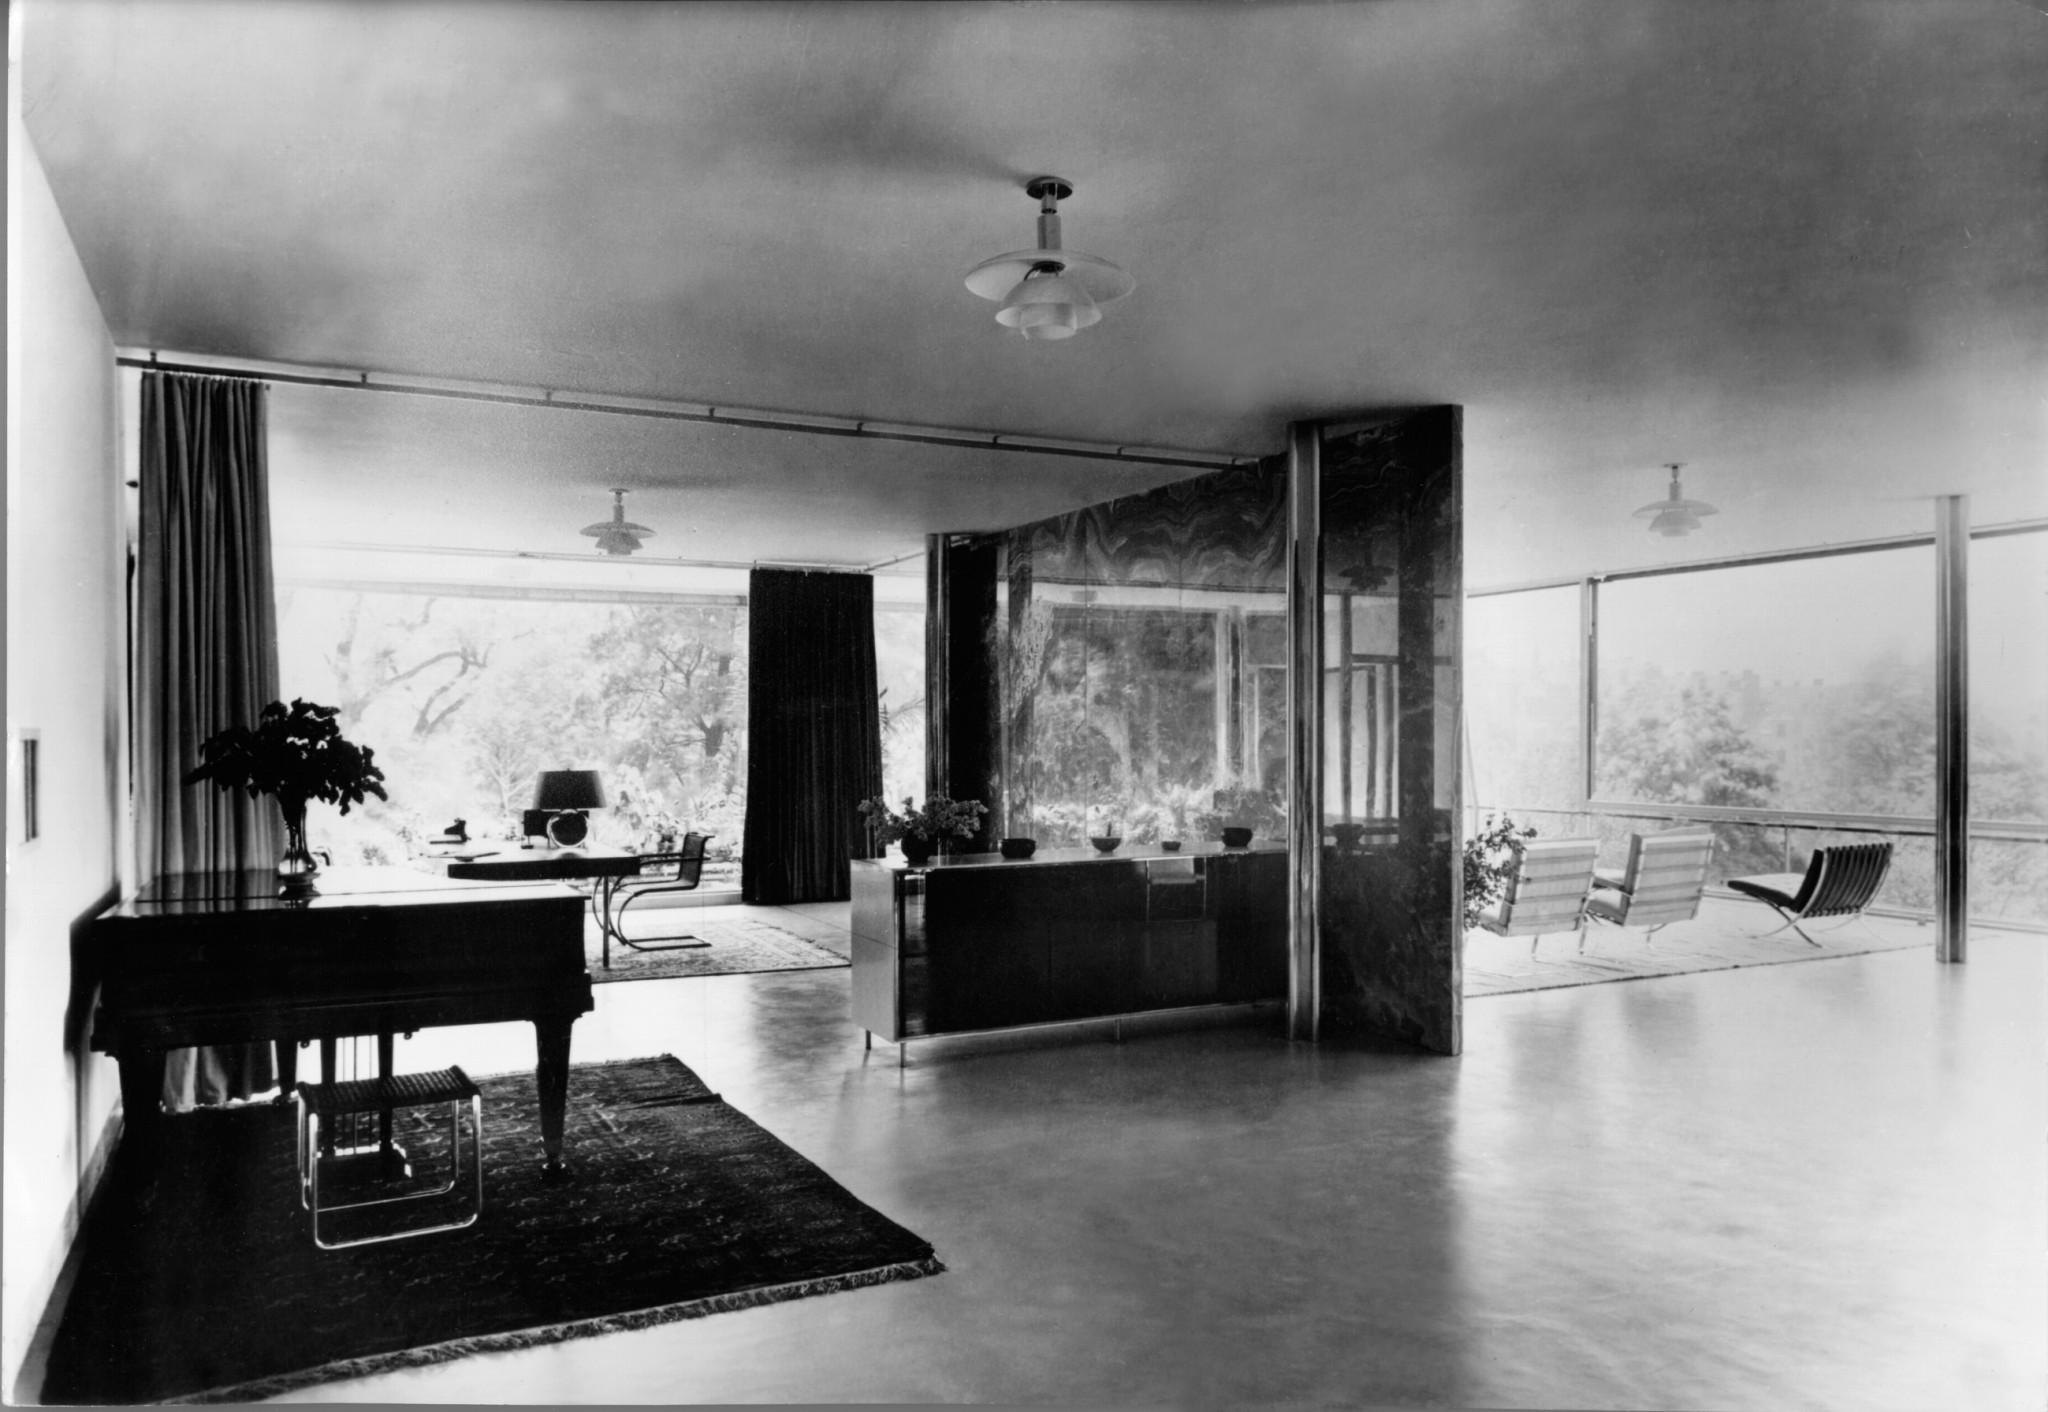 dokumentarfilm haus tugendhat im monopol kino ab 30 5. Black Bedroom Furniture Sets. Home Design Ideas